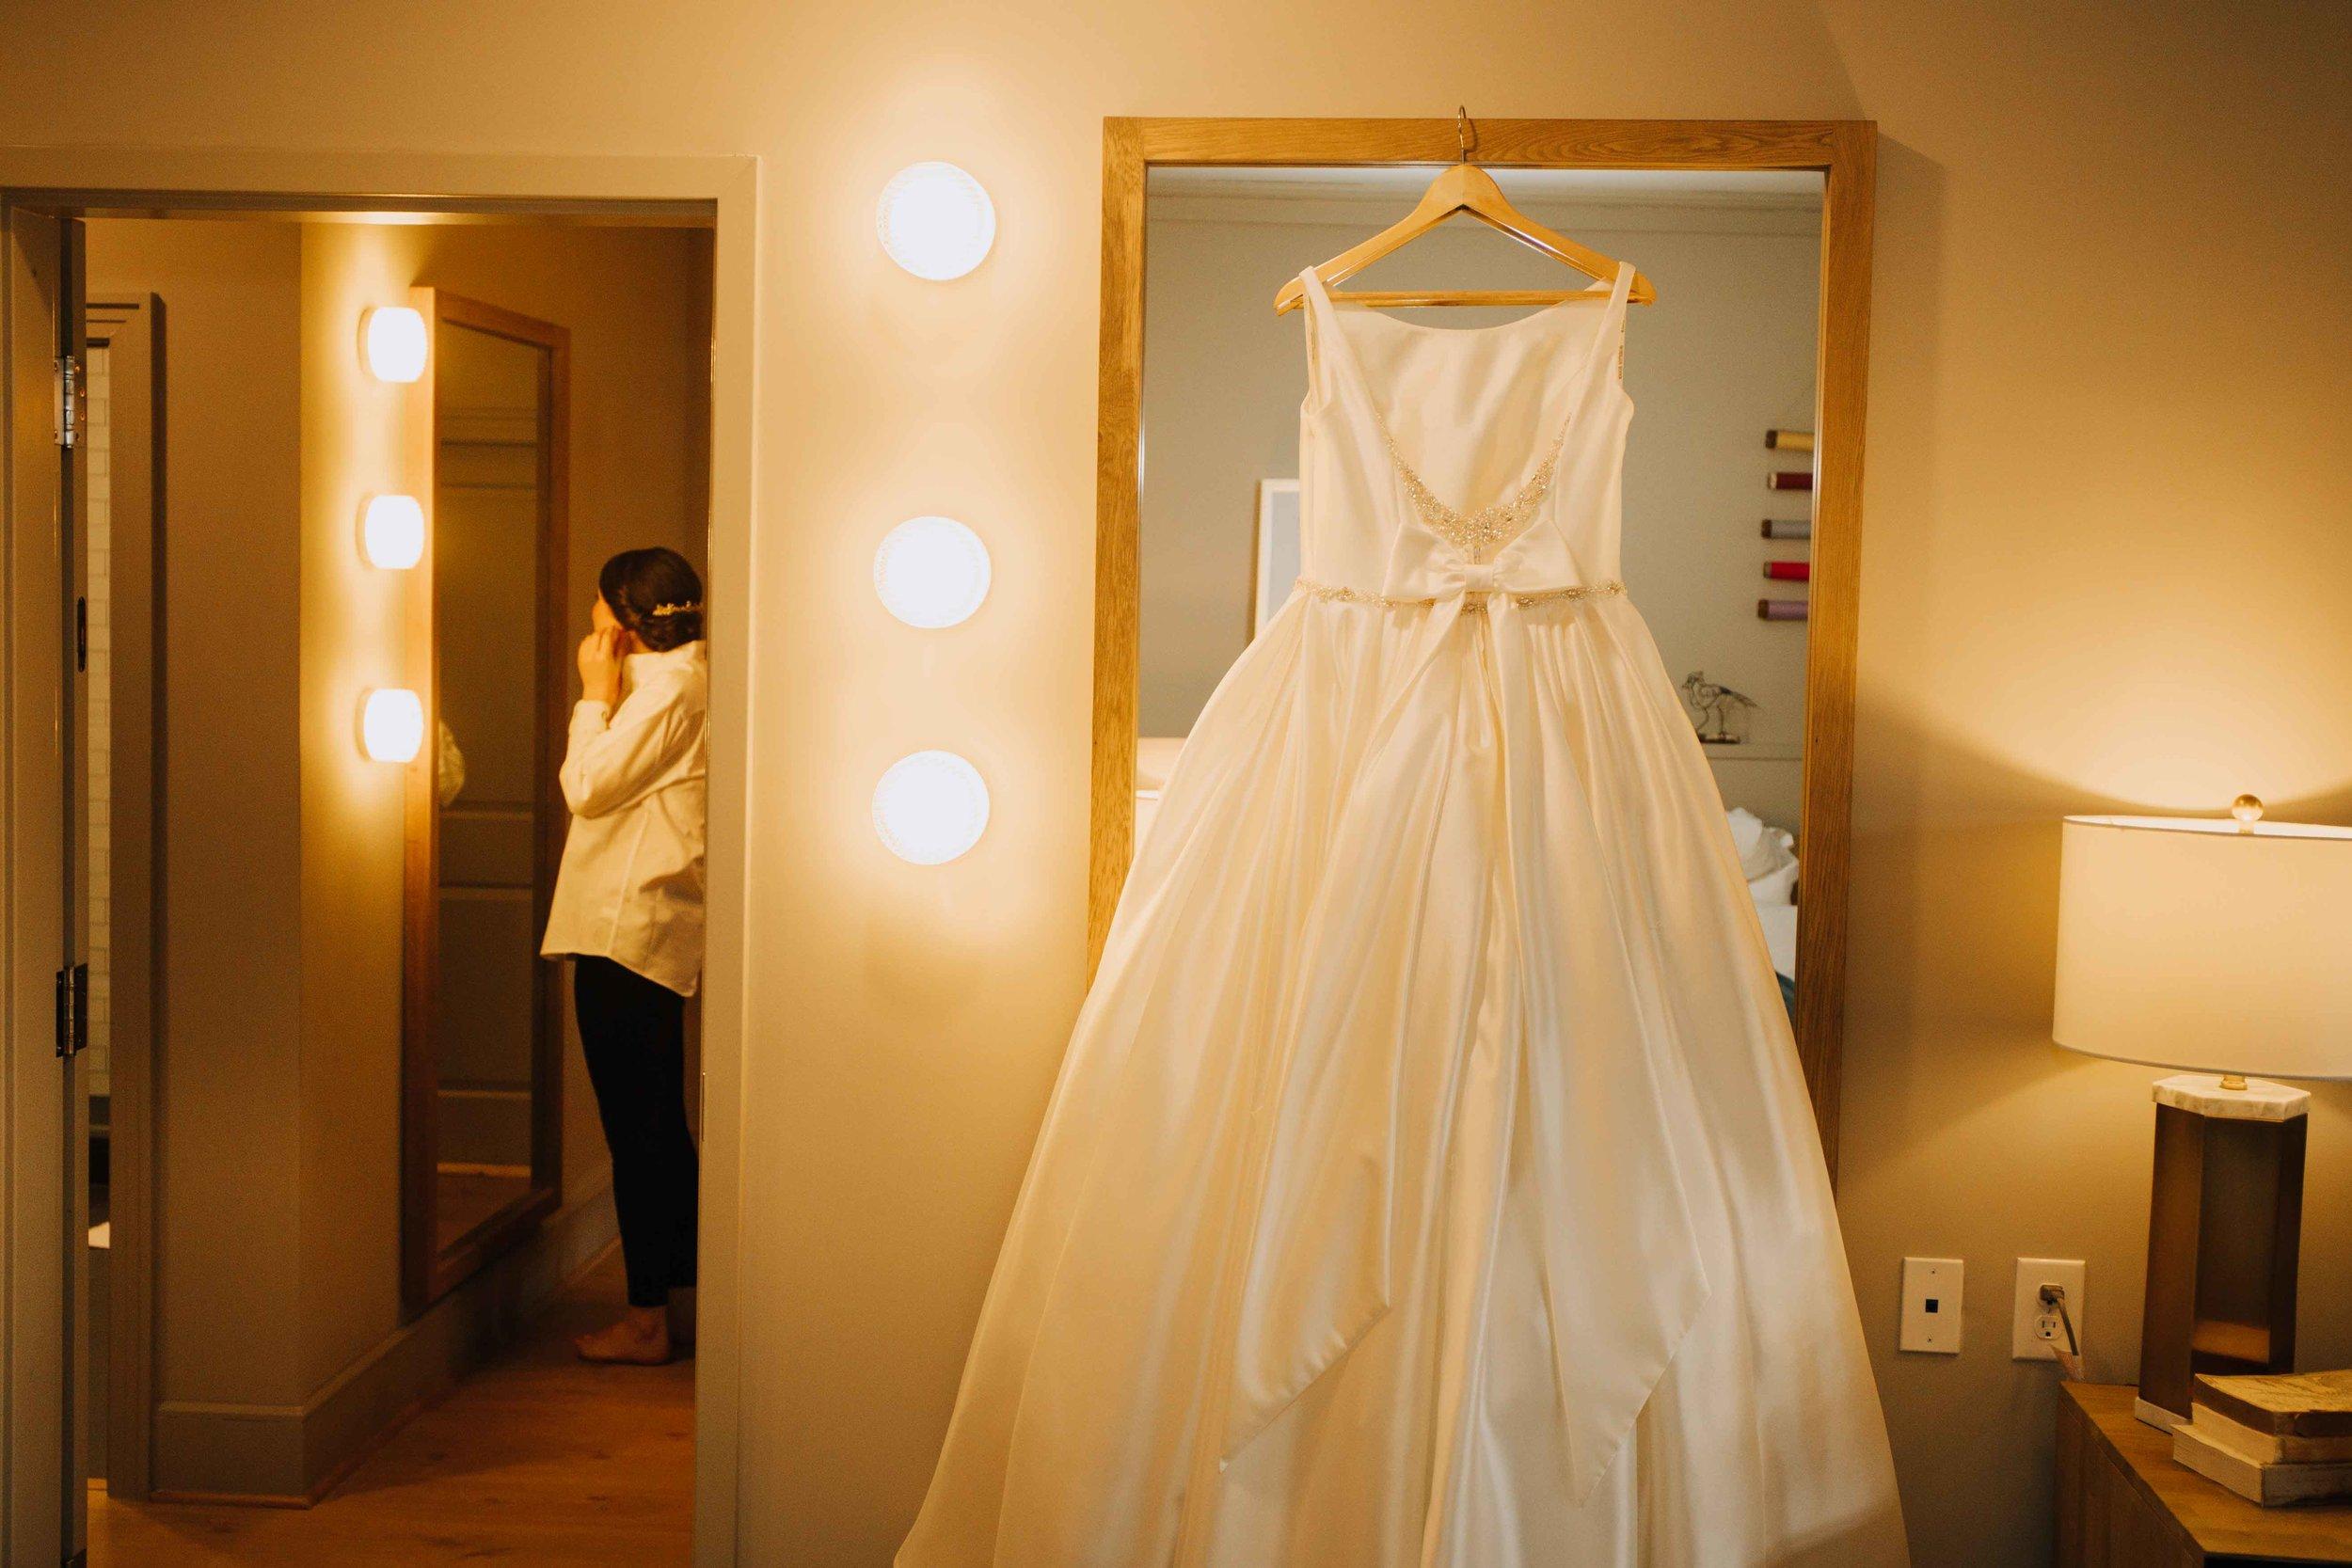 Farmville-Virginia-Wedding-Hotel-Weynoke-Downtown-Jacqueline-Waters-Photography-Detailed- (70).jpg